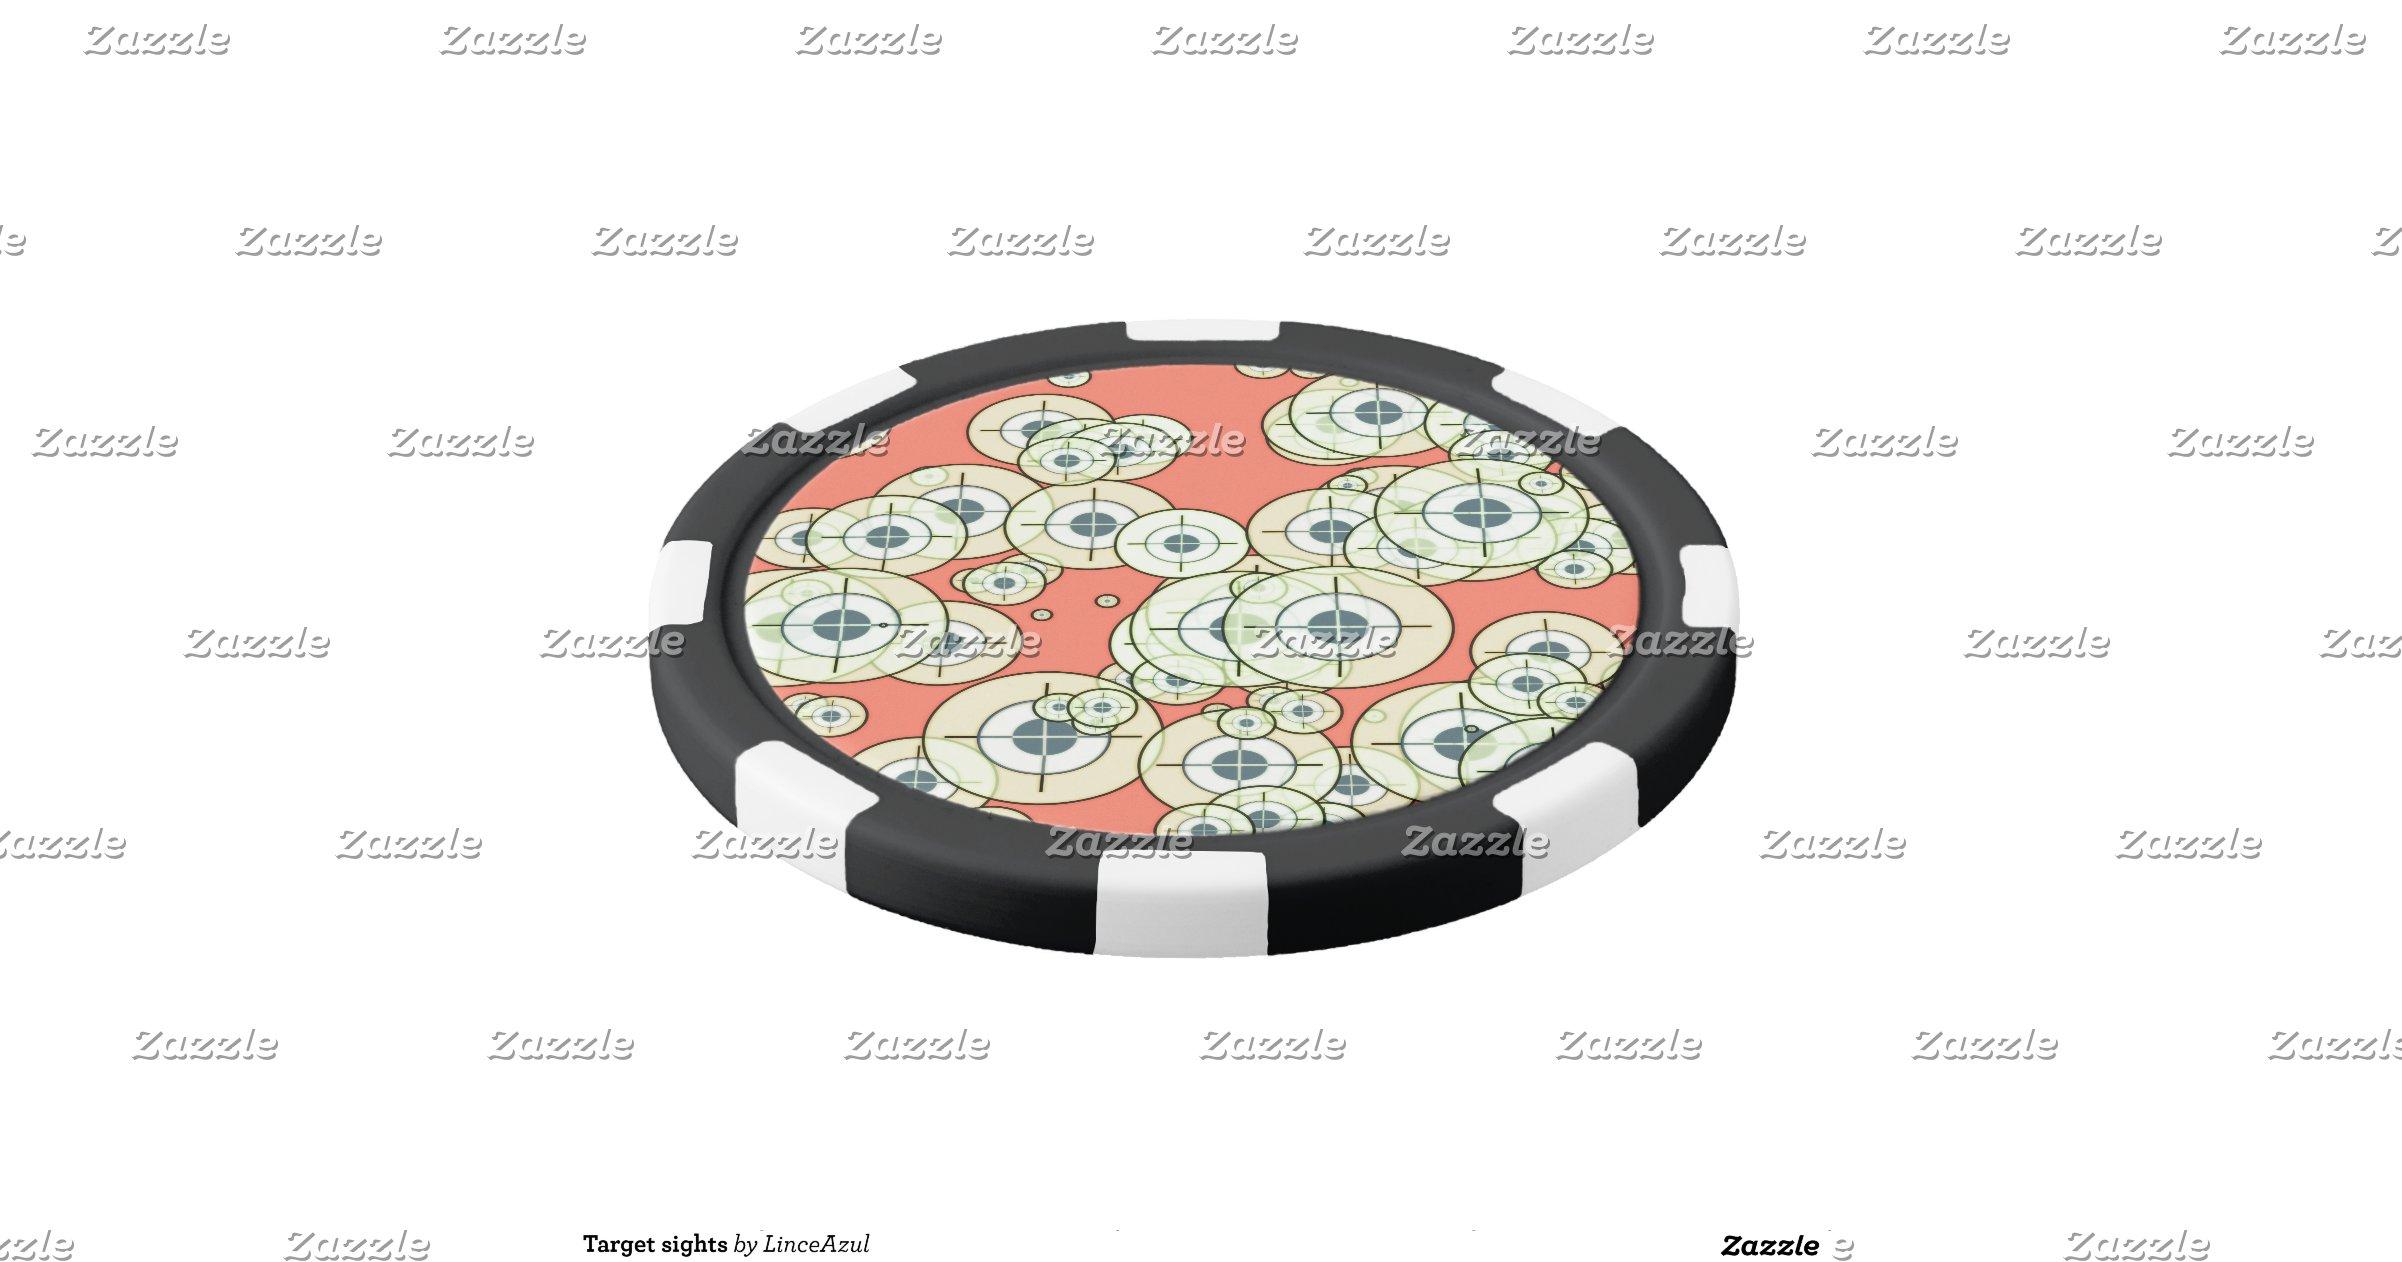 Poker sights